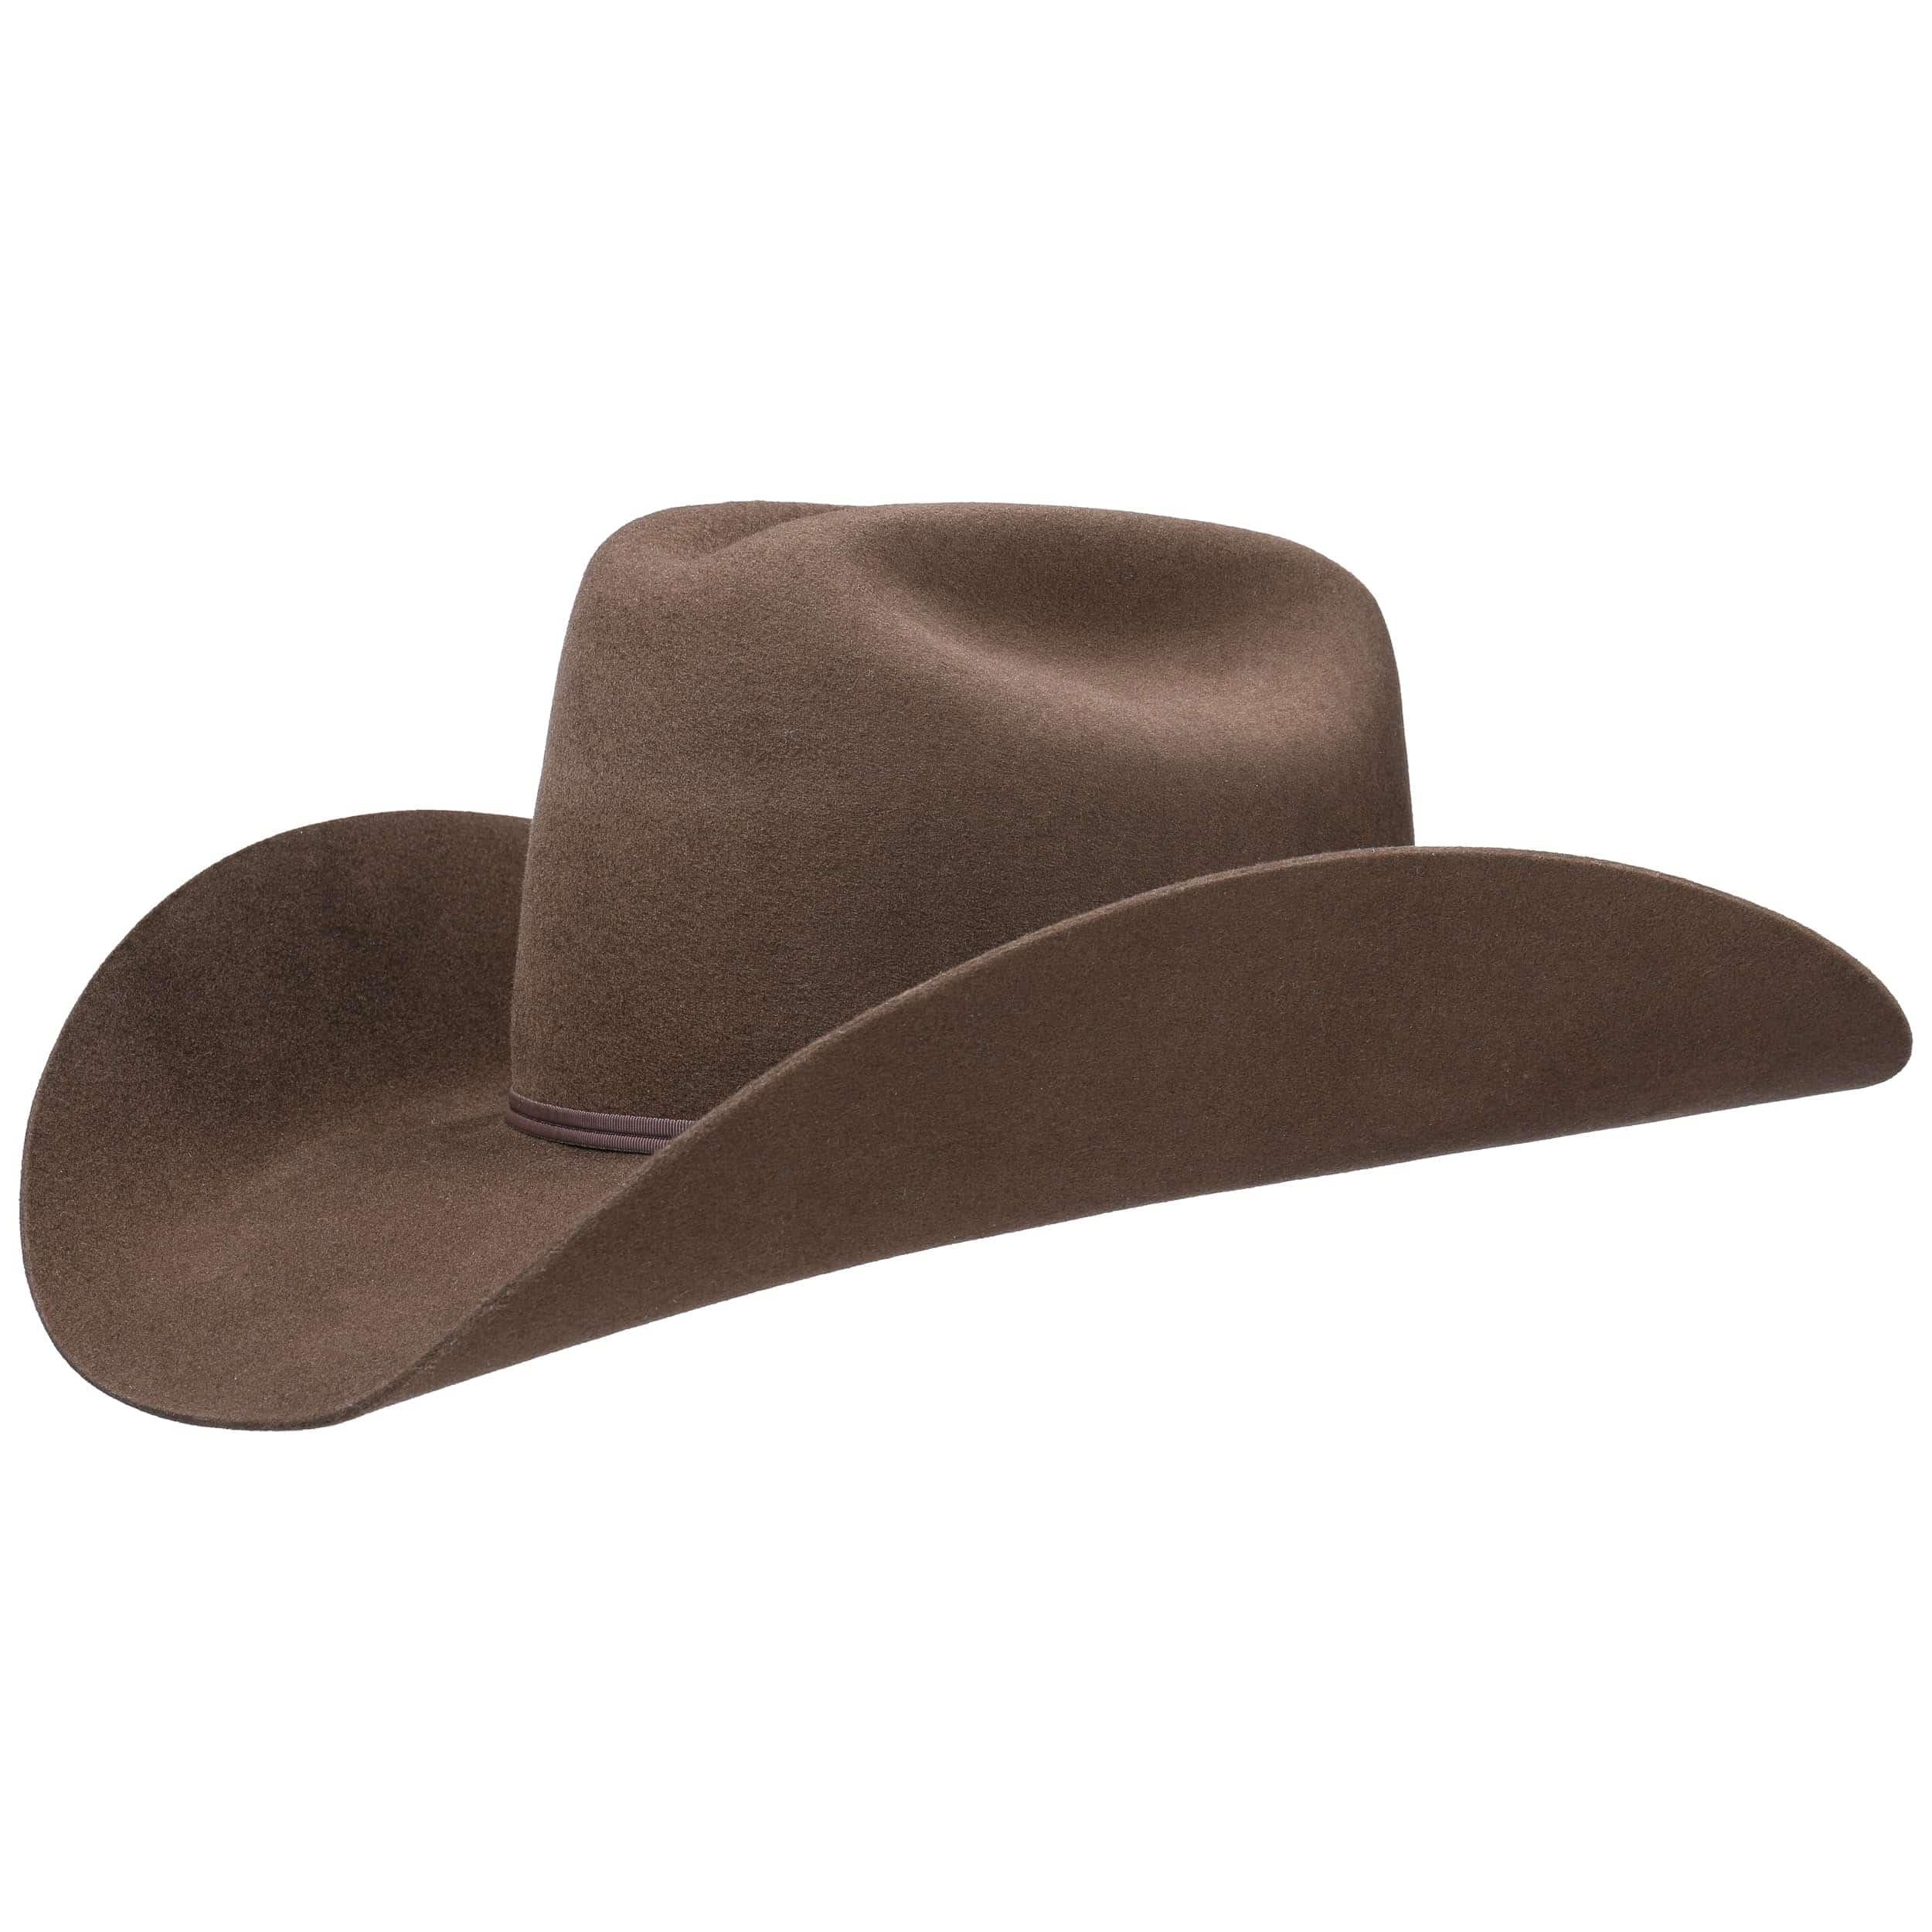 7429e197ccf53 Western 2x Vitafelt Cattleman Hat By Stetson Eur 19900 Hats